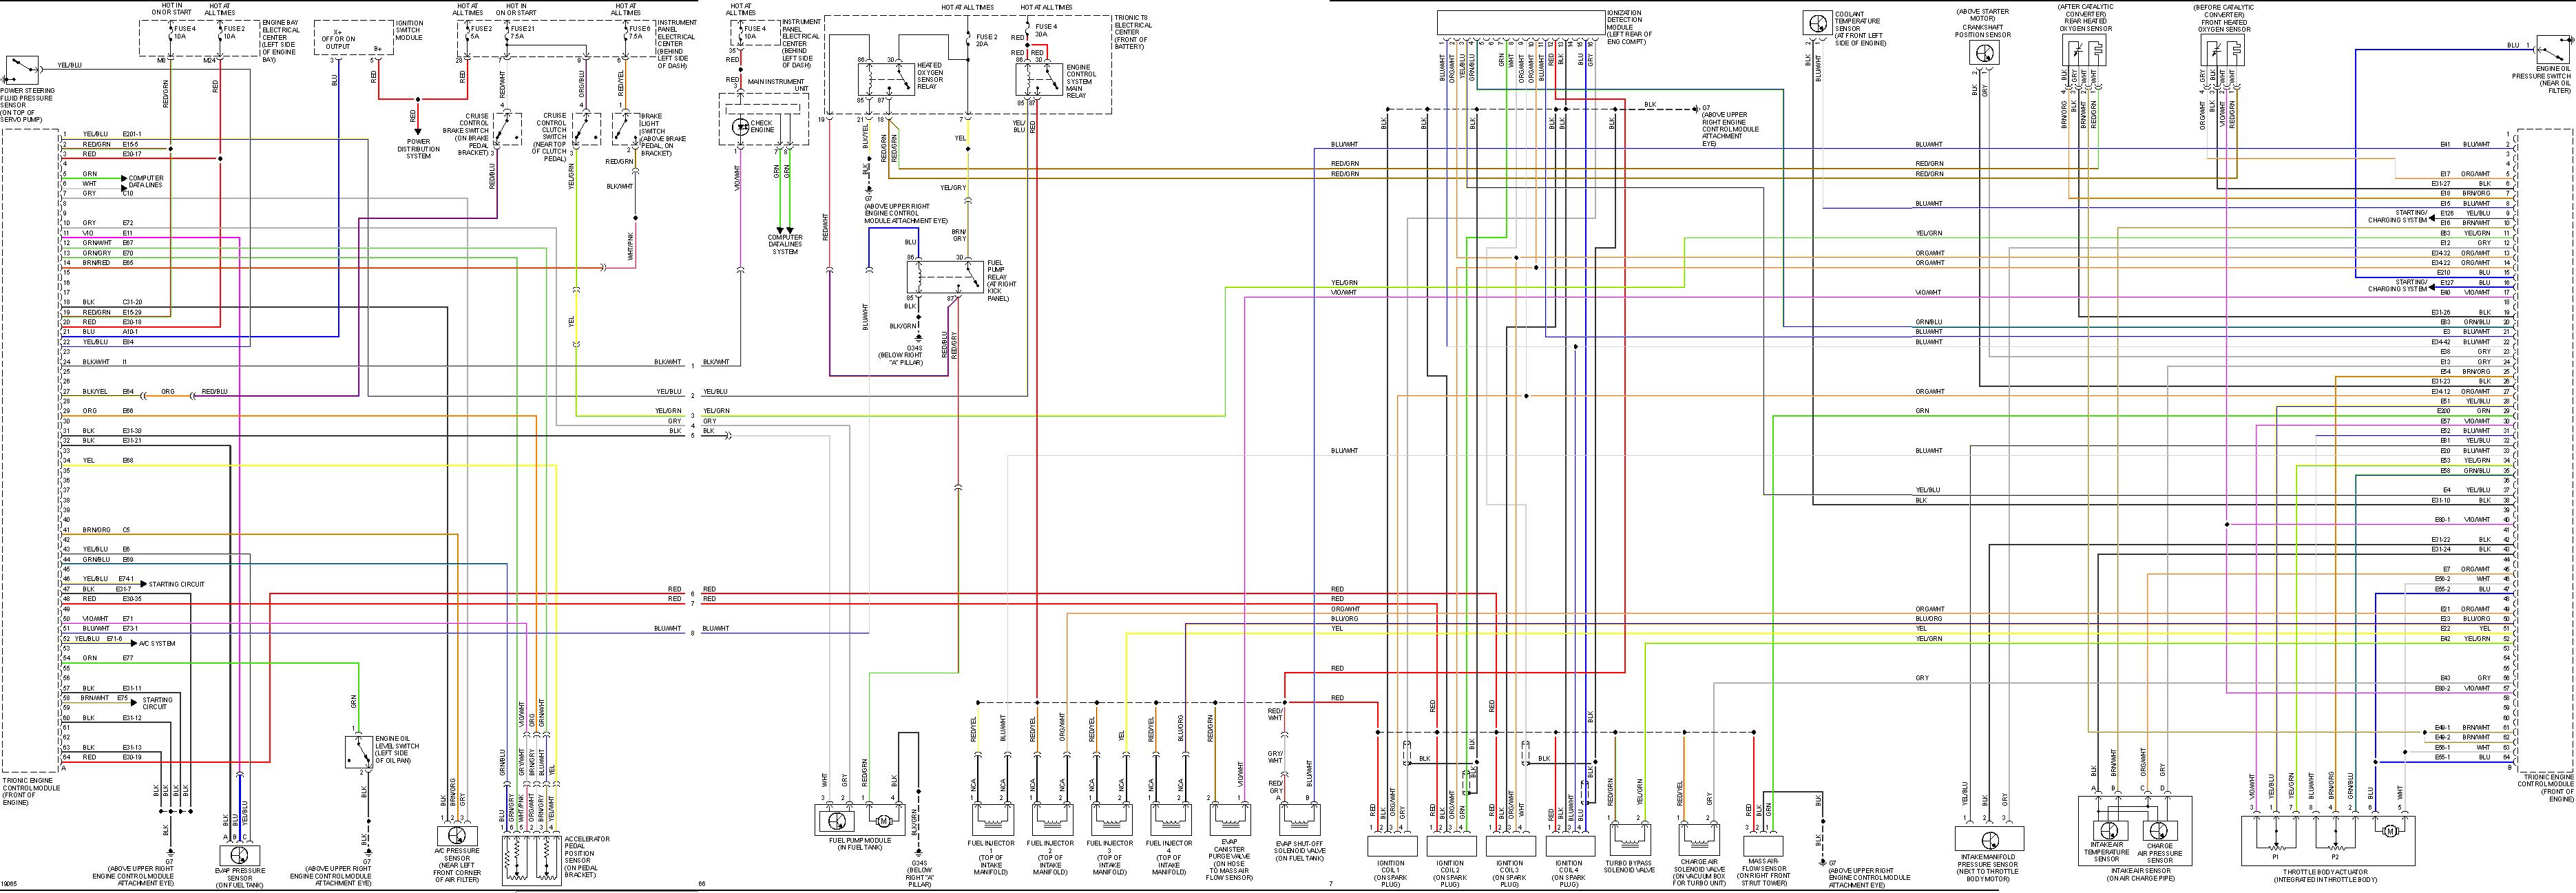 2006 saab 9 3 wiring diagram - 2000 mustang gt engine diagram -  audi-a3.tukune.jeanjaures37.fr  wiring diagram resource